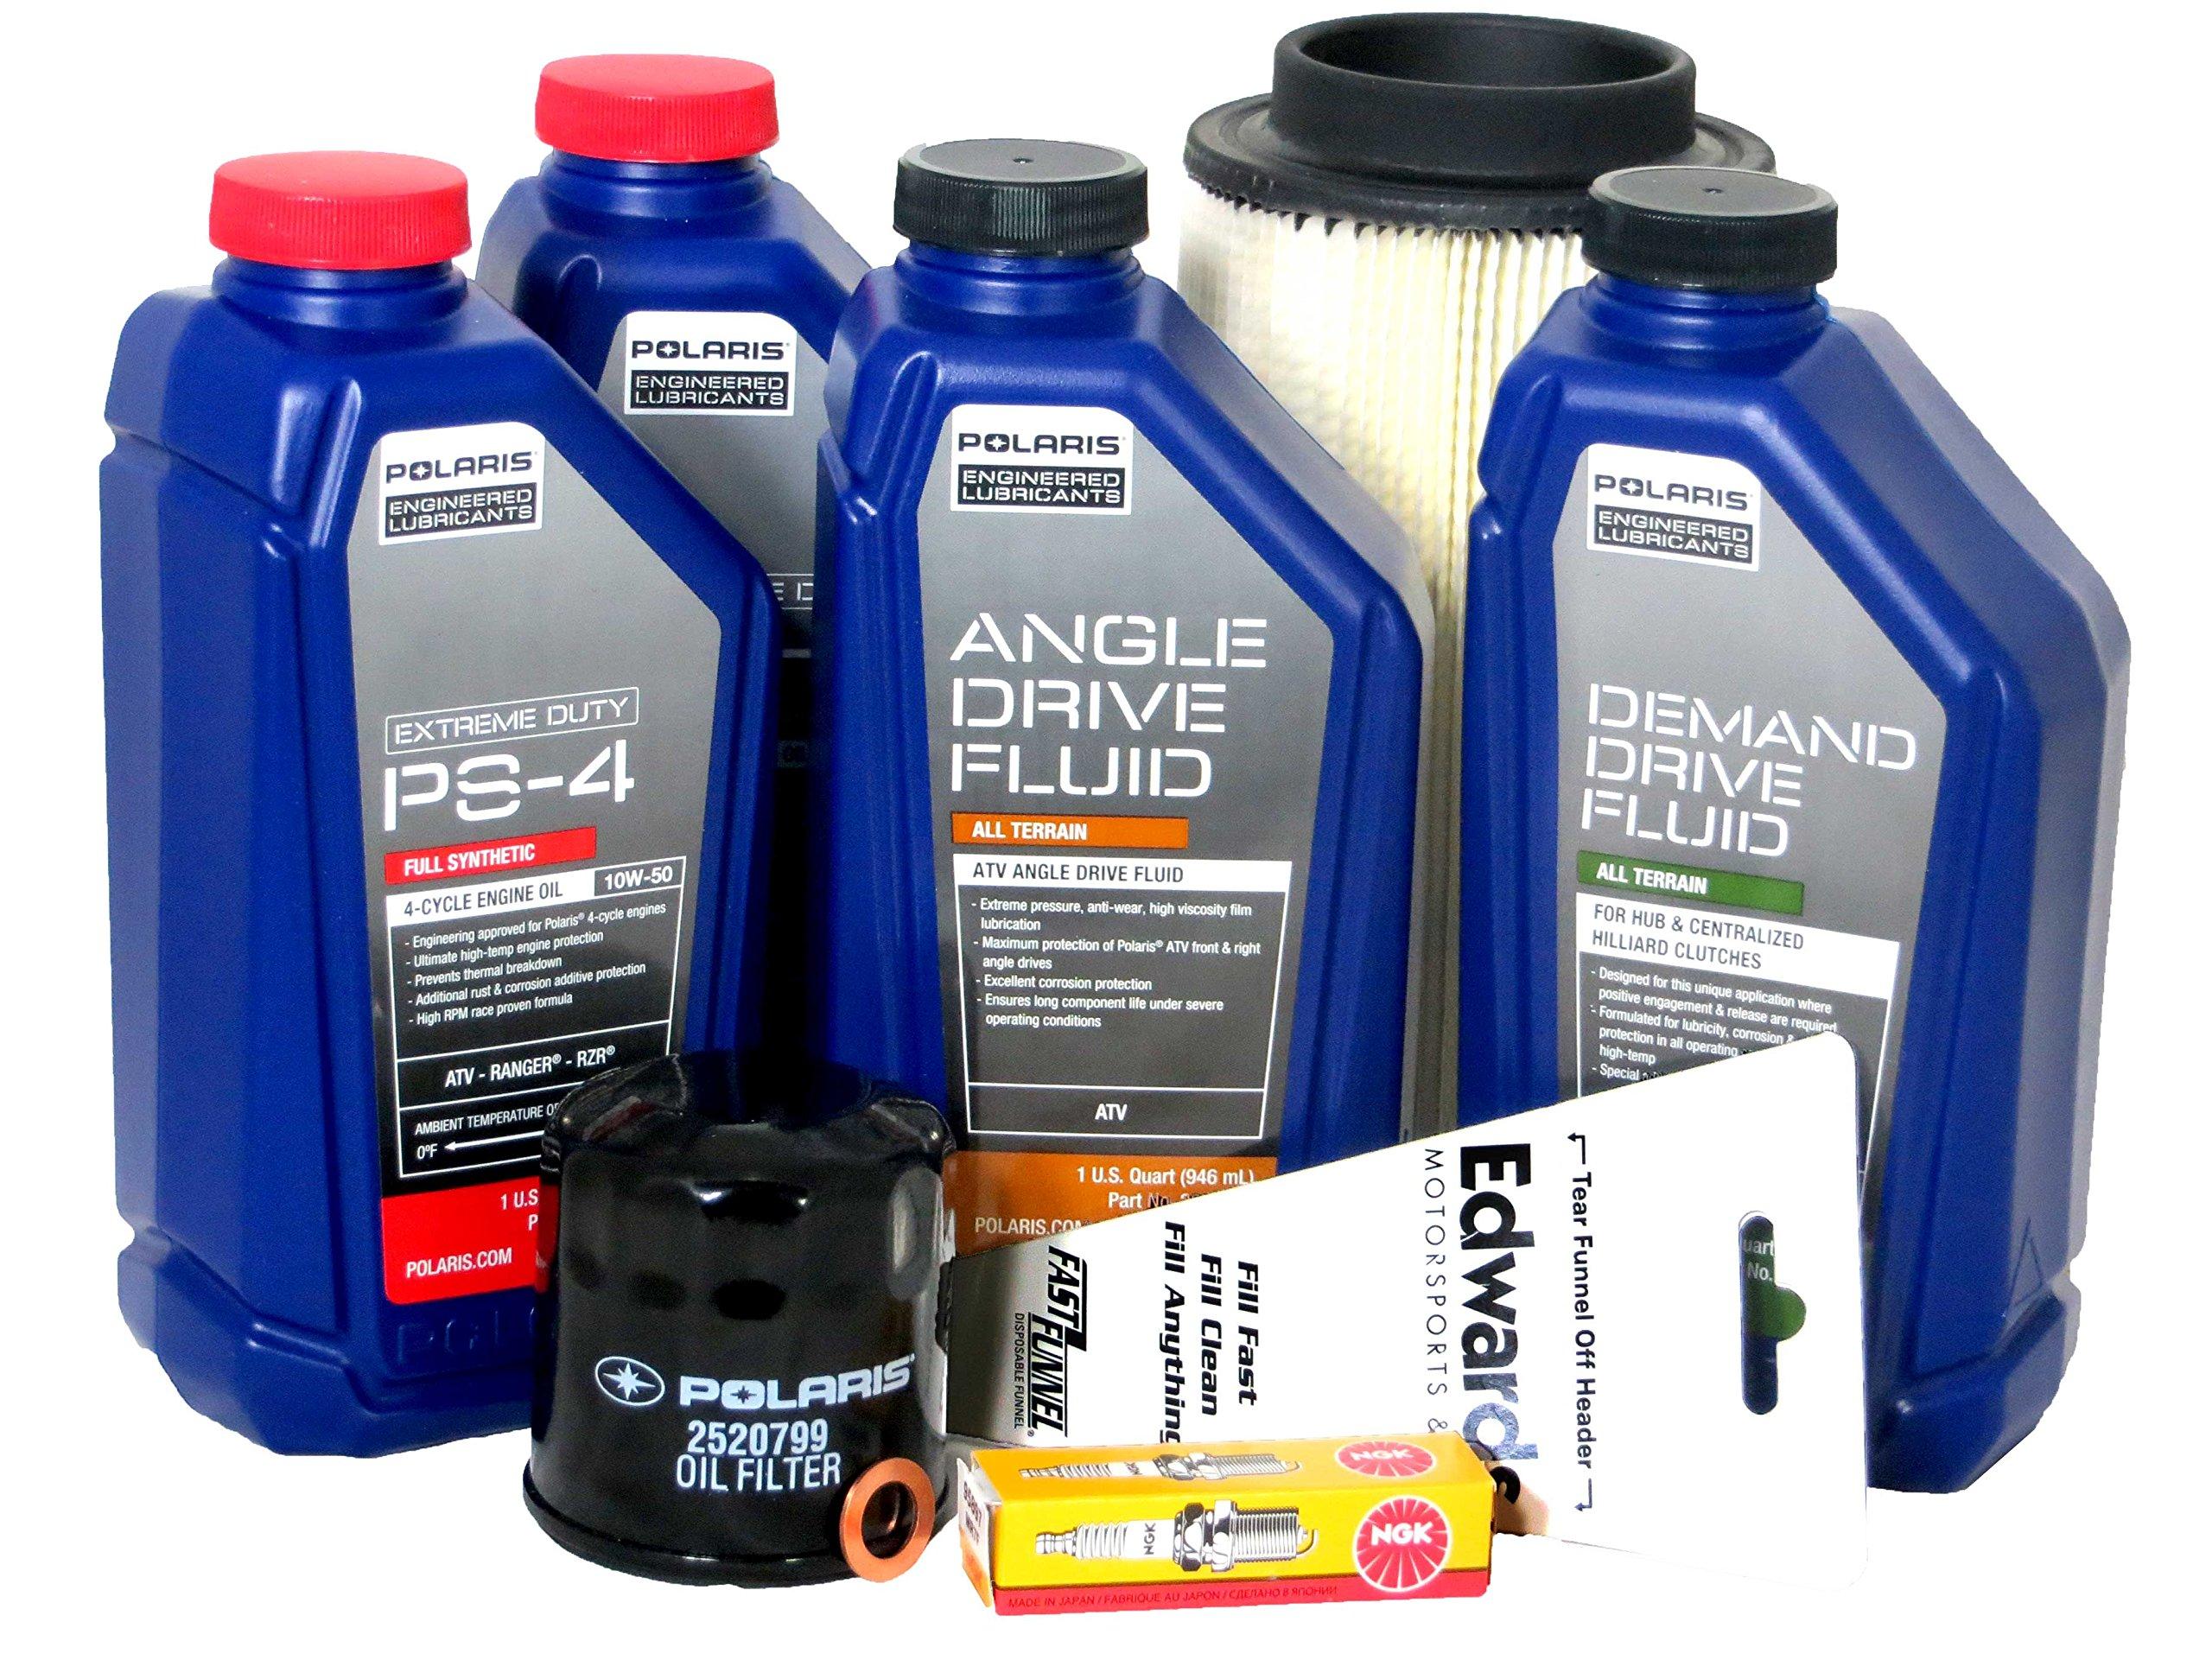 2014-2018 Polaris Sportsman 570 Extreme Full Service Maintenance Kit